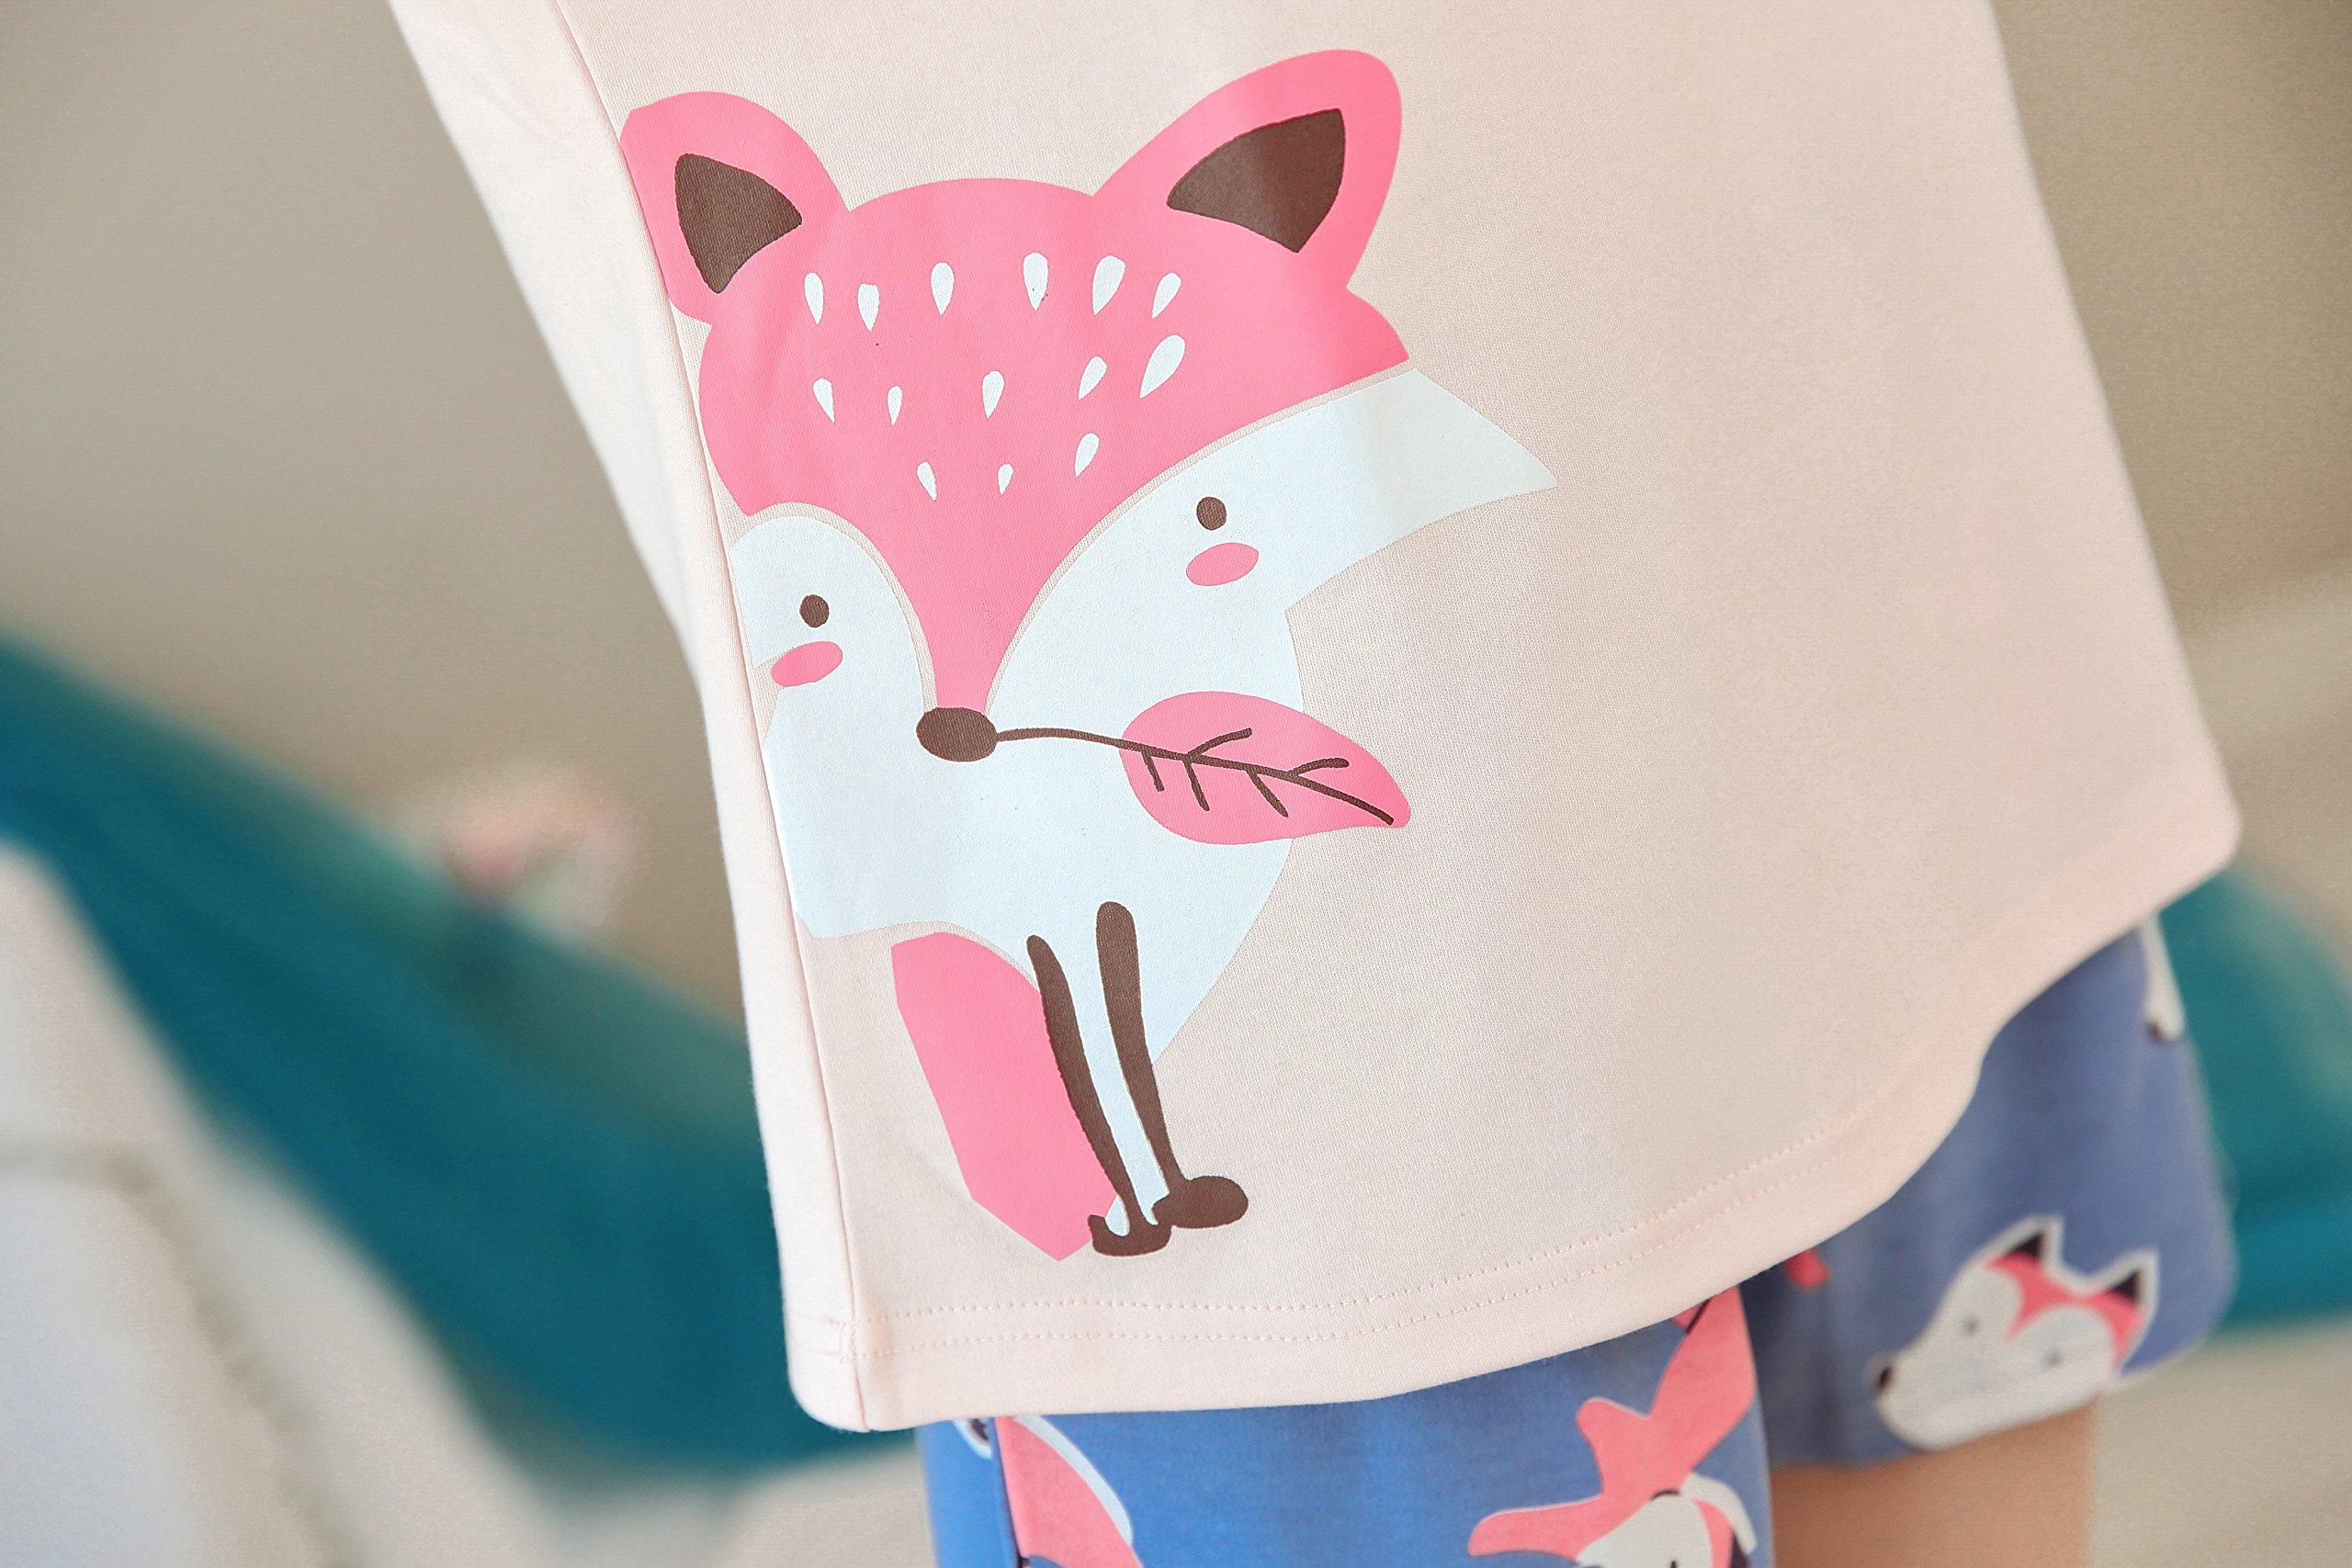 KINYBABY Big Girls Summer Pajama Set Cute Fox Printed Cotton Sleepwear Top&Shorts Pink Fox L by KINYBABY (Image #7)